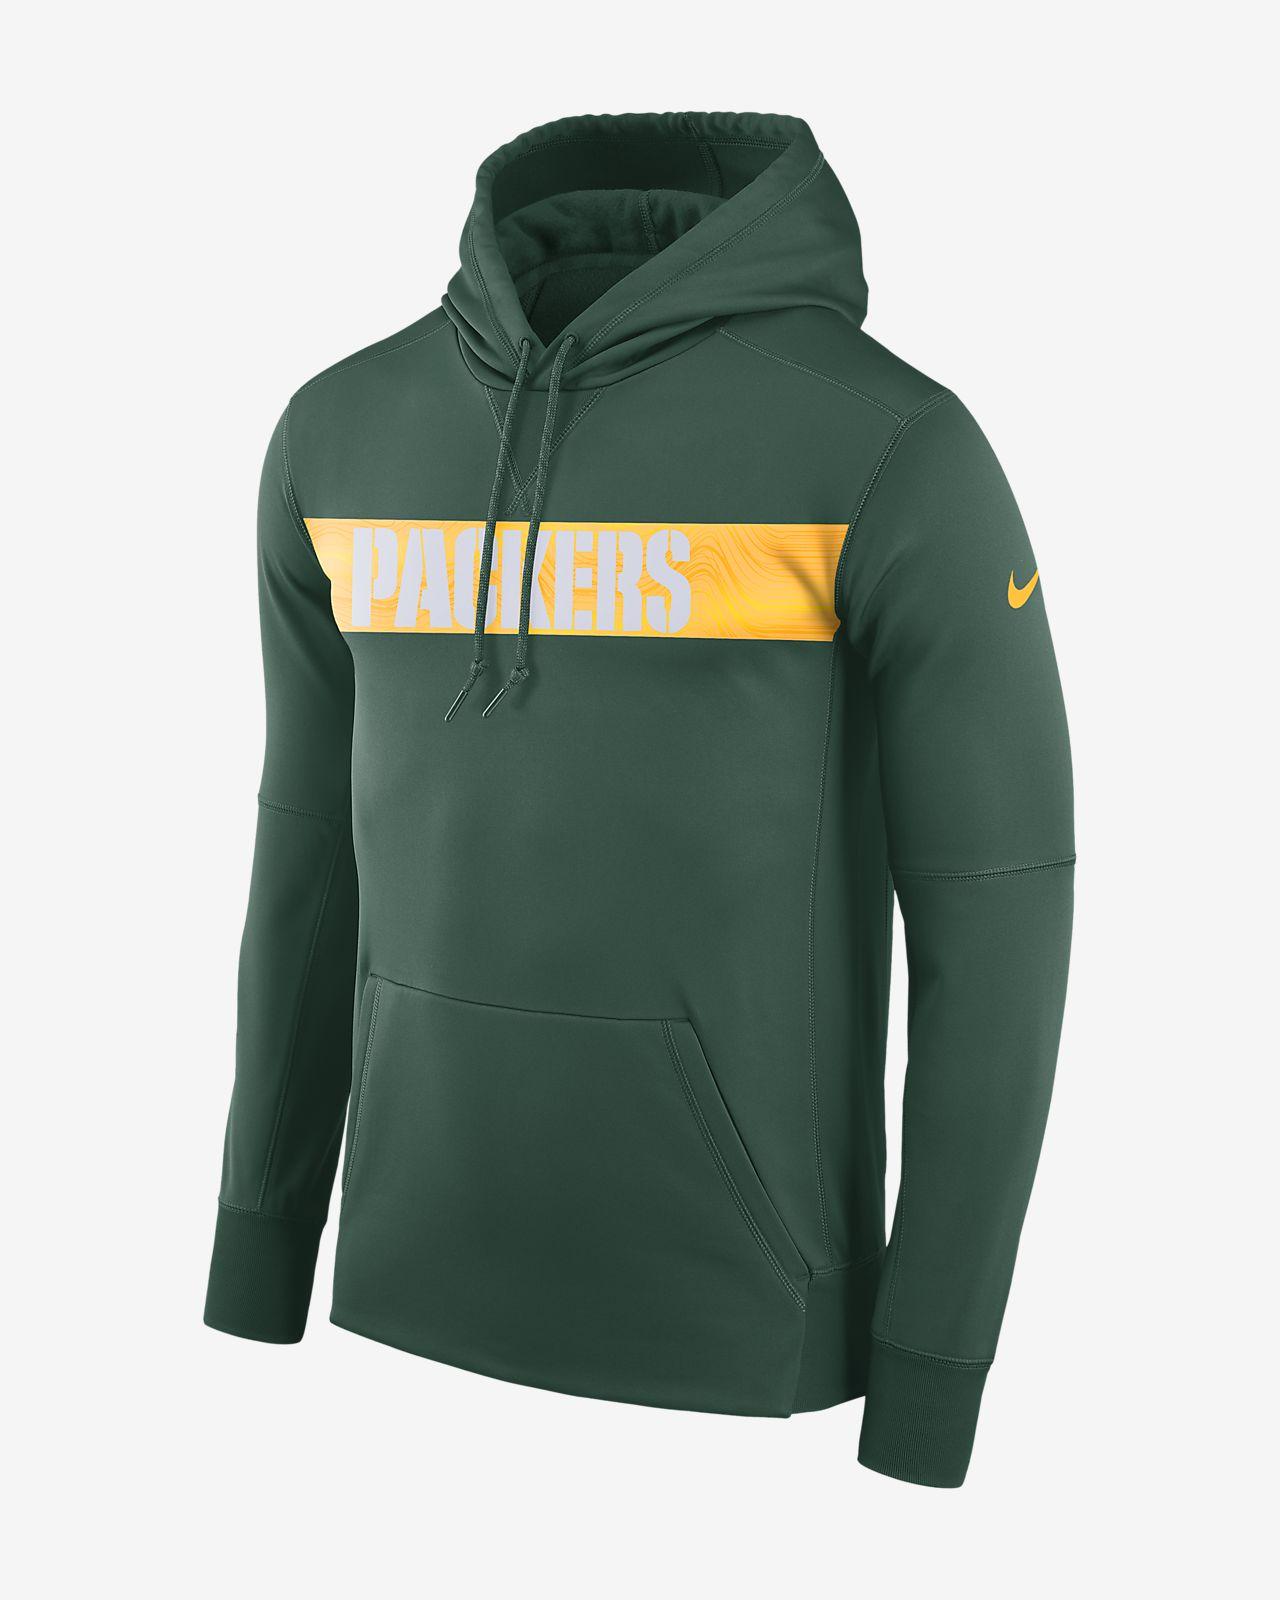 Nike Dri-FIT Therma (NFL Packers) Men's Pullover Hoodie